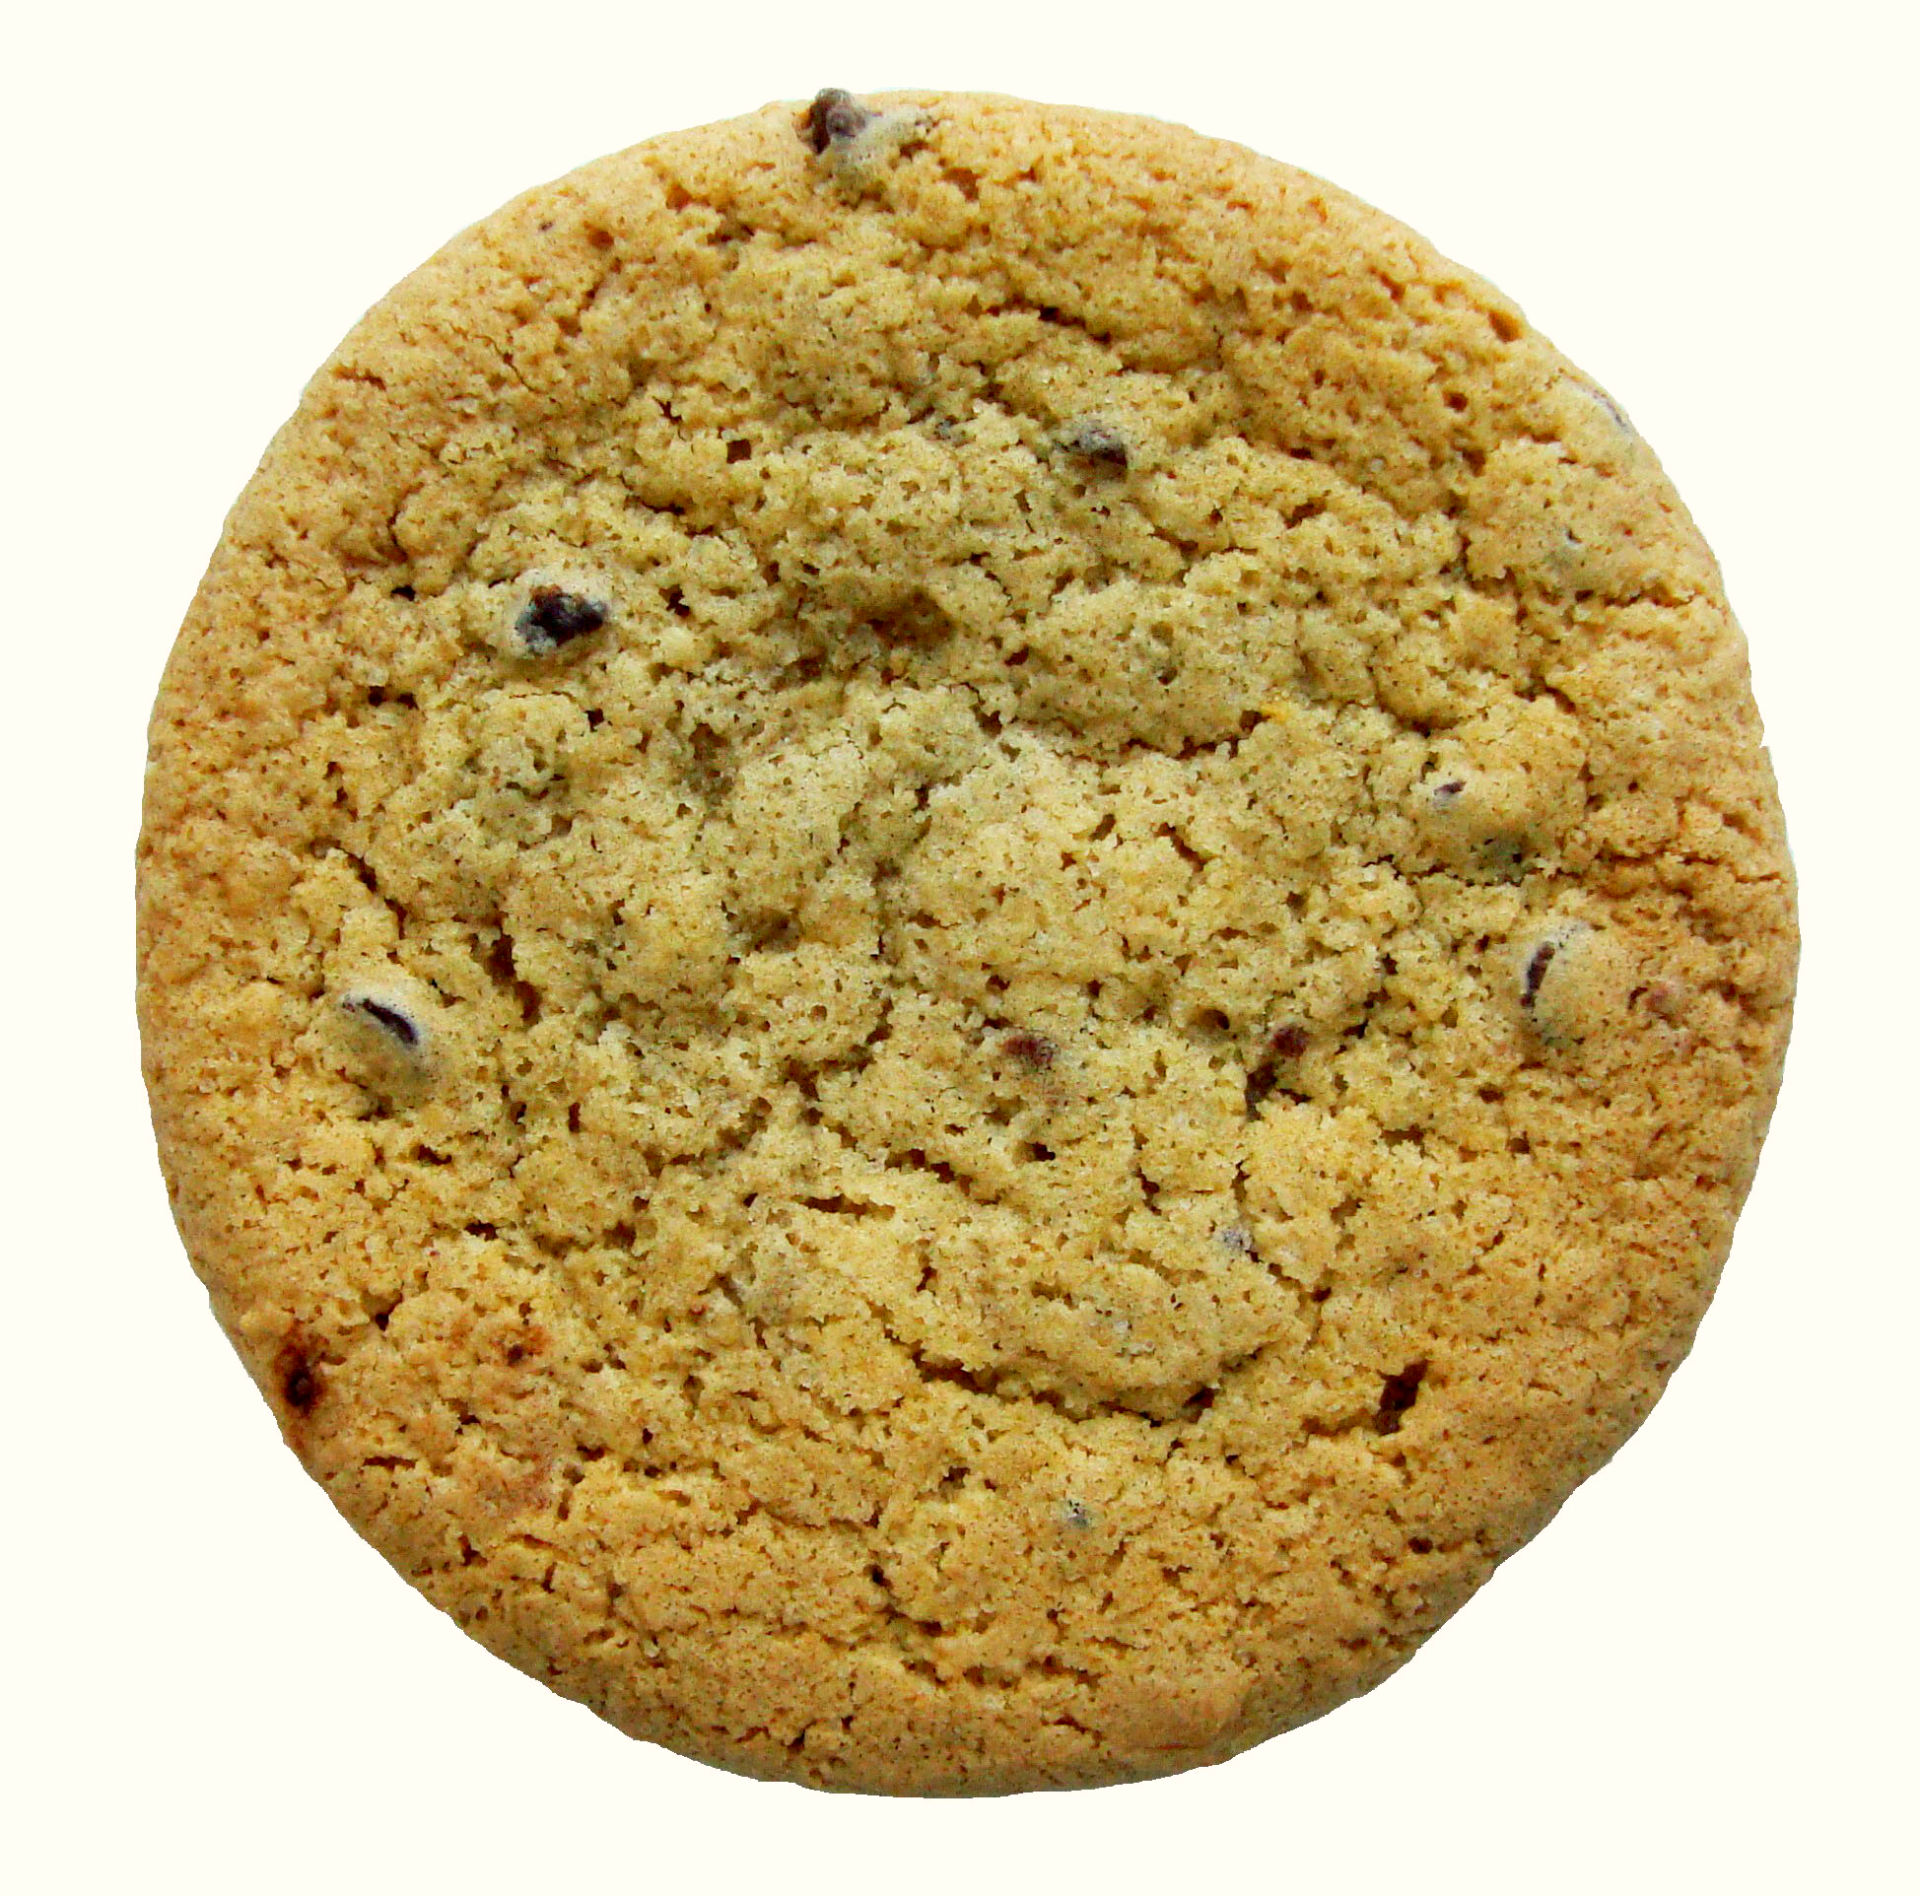 Cookie chocochip_edited.jpg